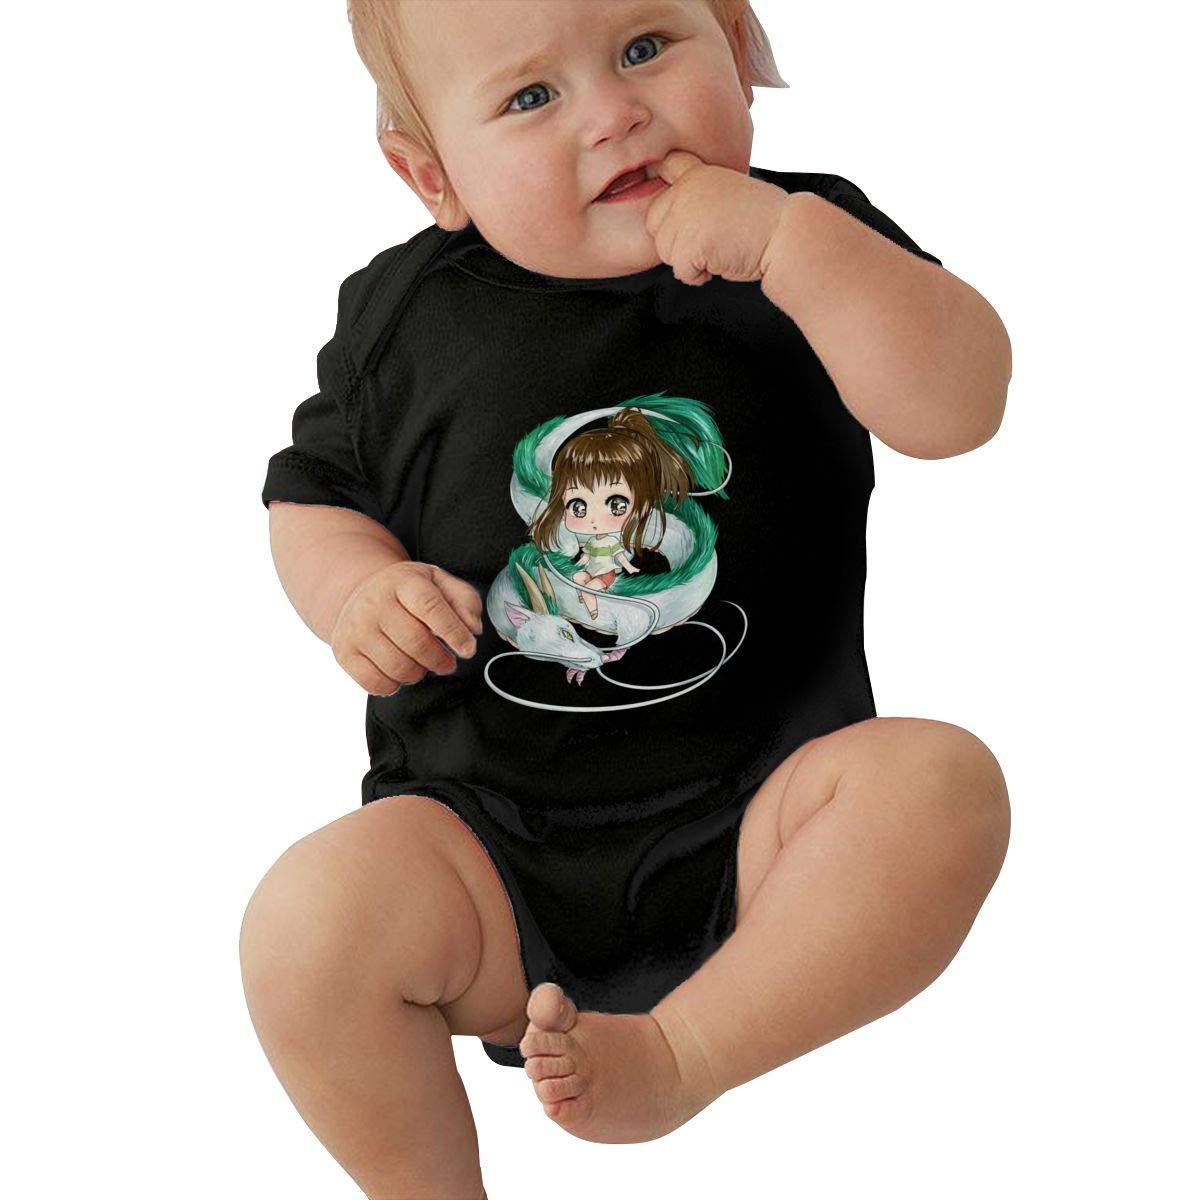 Juwuwenhuachua Baby Boy Girl Round Neck Short Sleeve Climbing Clothes Spirited Away Funny Jumpsuit Black